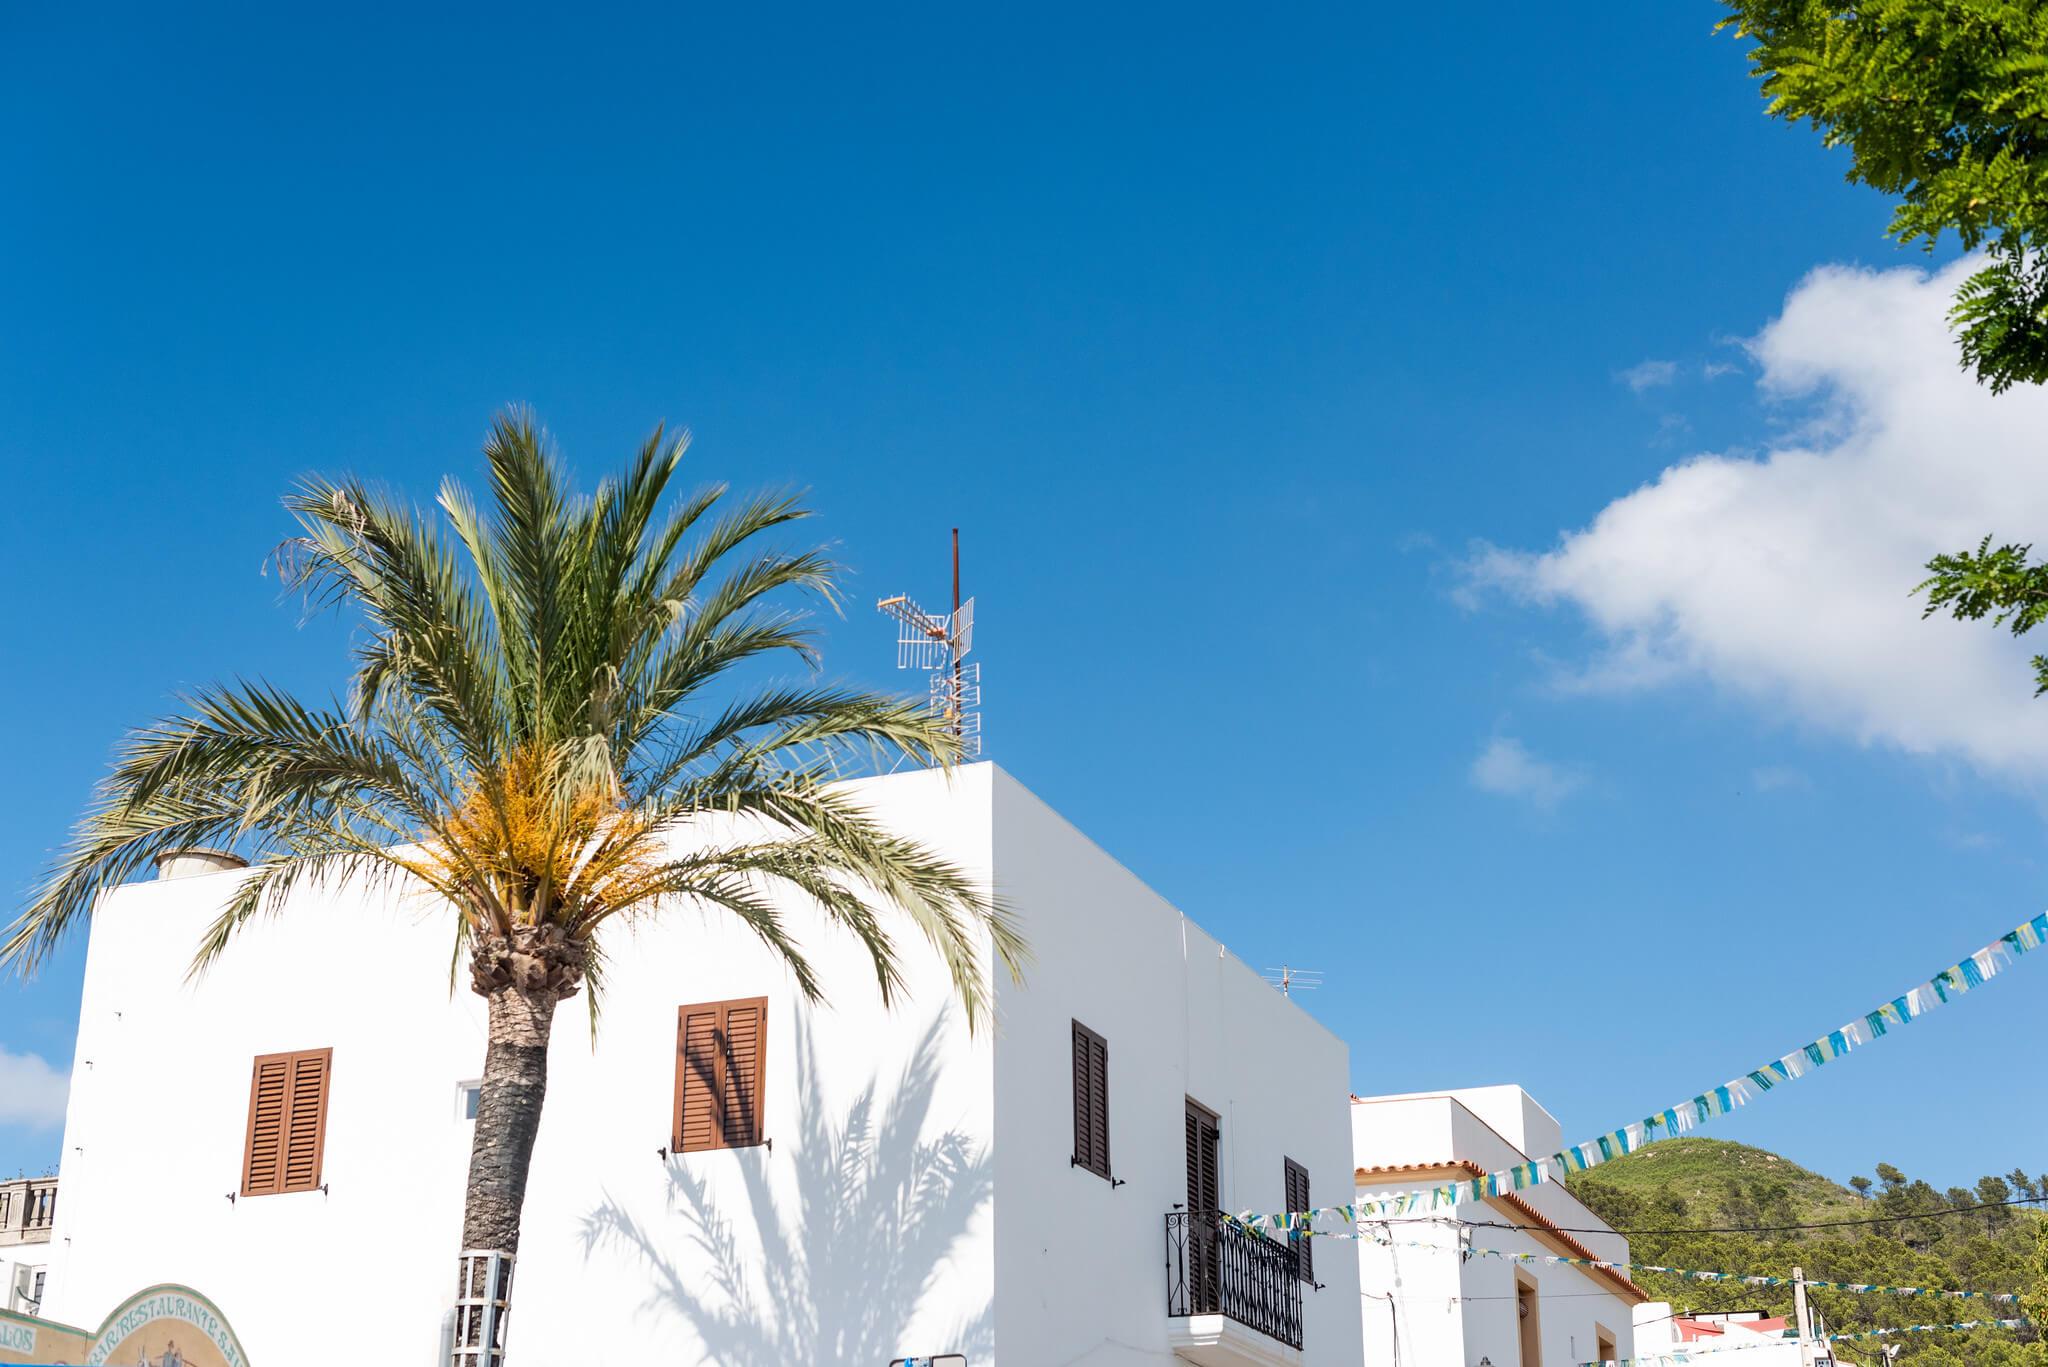 https://www.white-ibiza.com/wp-content/uploads/2020/05/white-ibiza-villas-where-to-buy-san-juan-04.jpg